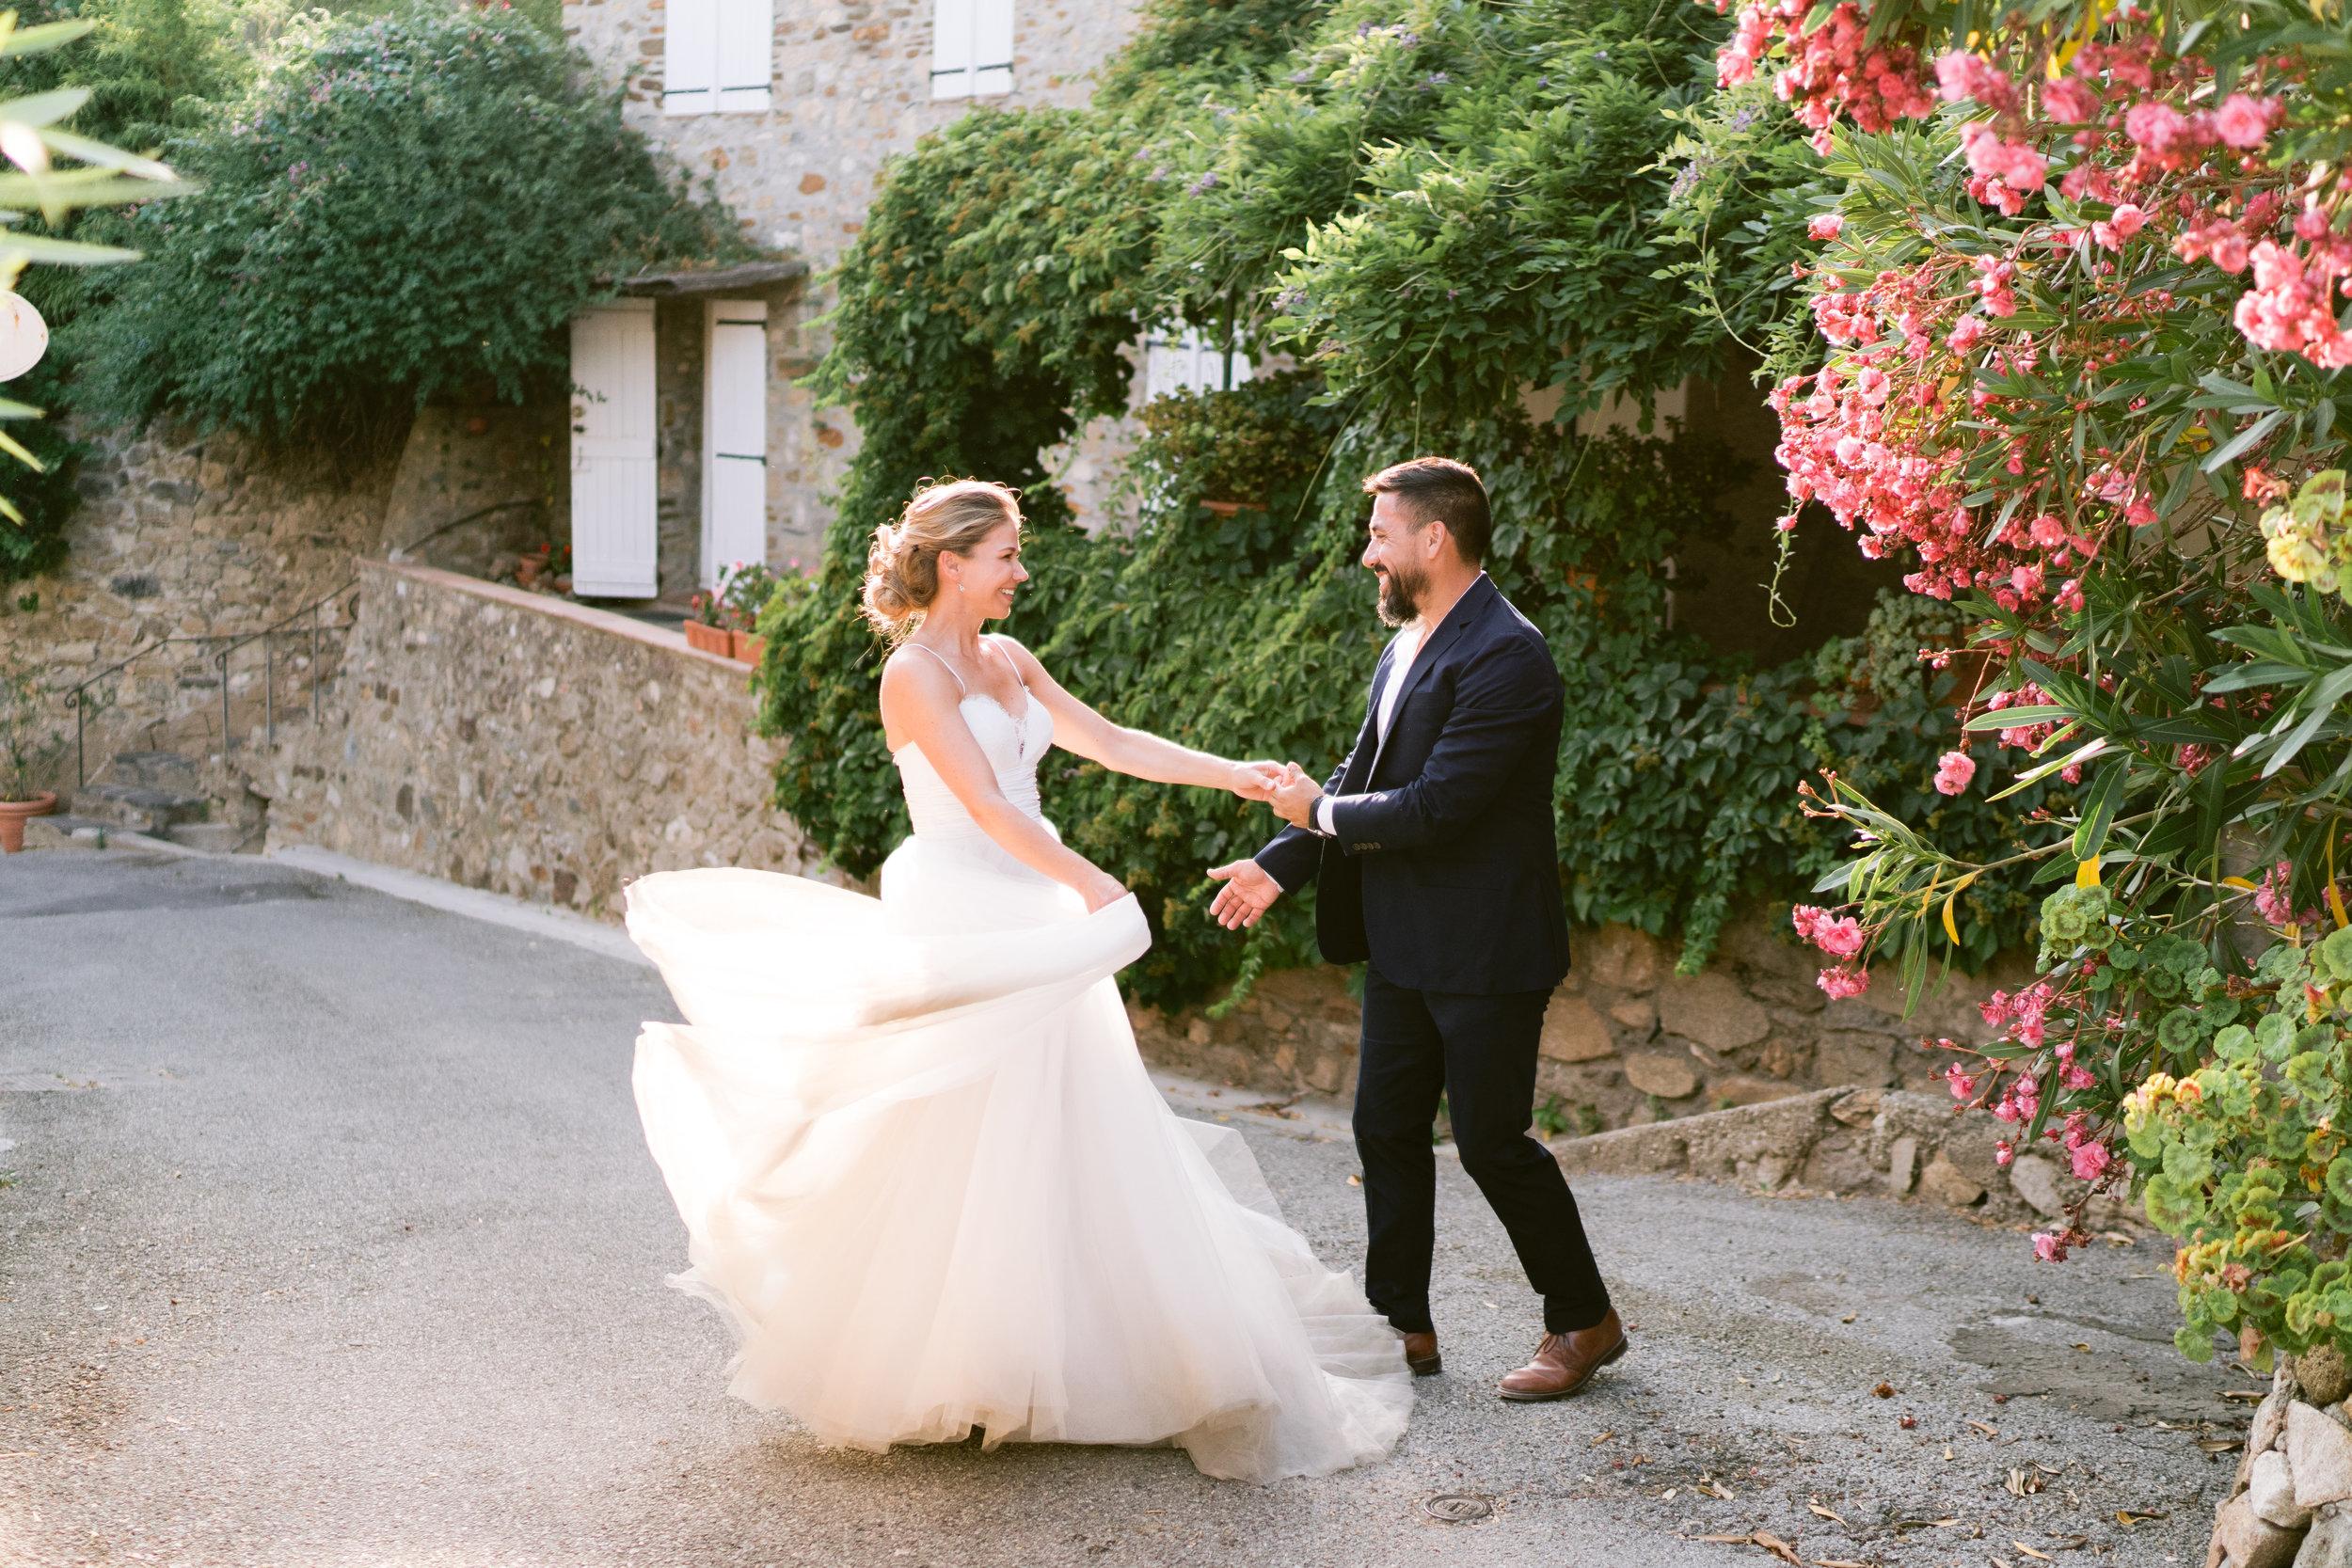 english photographer in france, wedding photographer saint tropez, romantic wedding photography france, chateau wedding france, cote d'azur wedding photographer, ramatuelle wedding (9).jpg